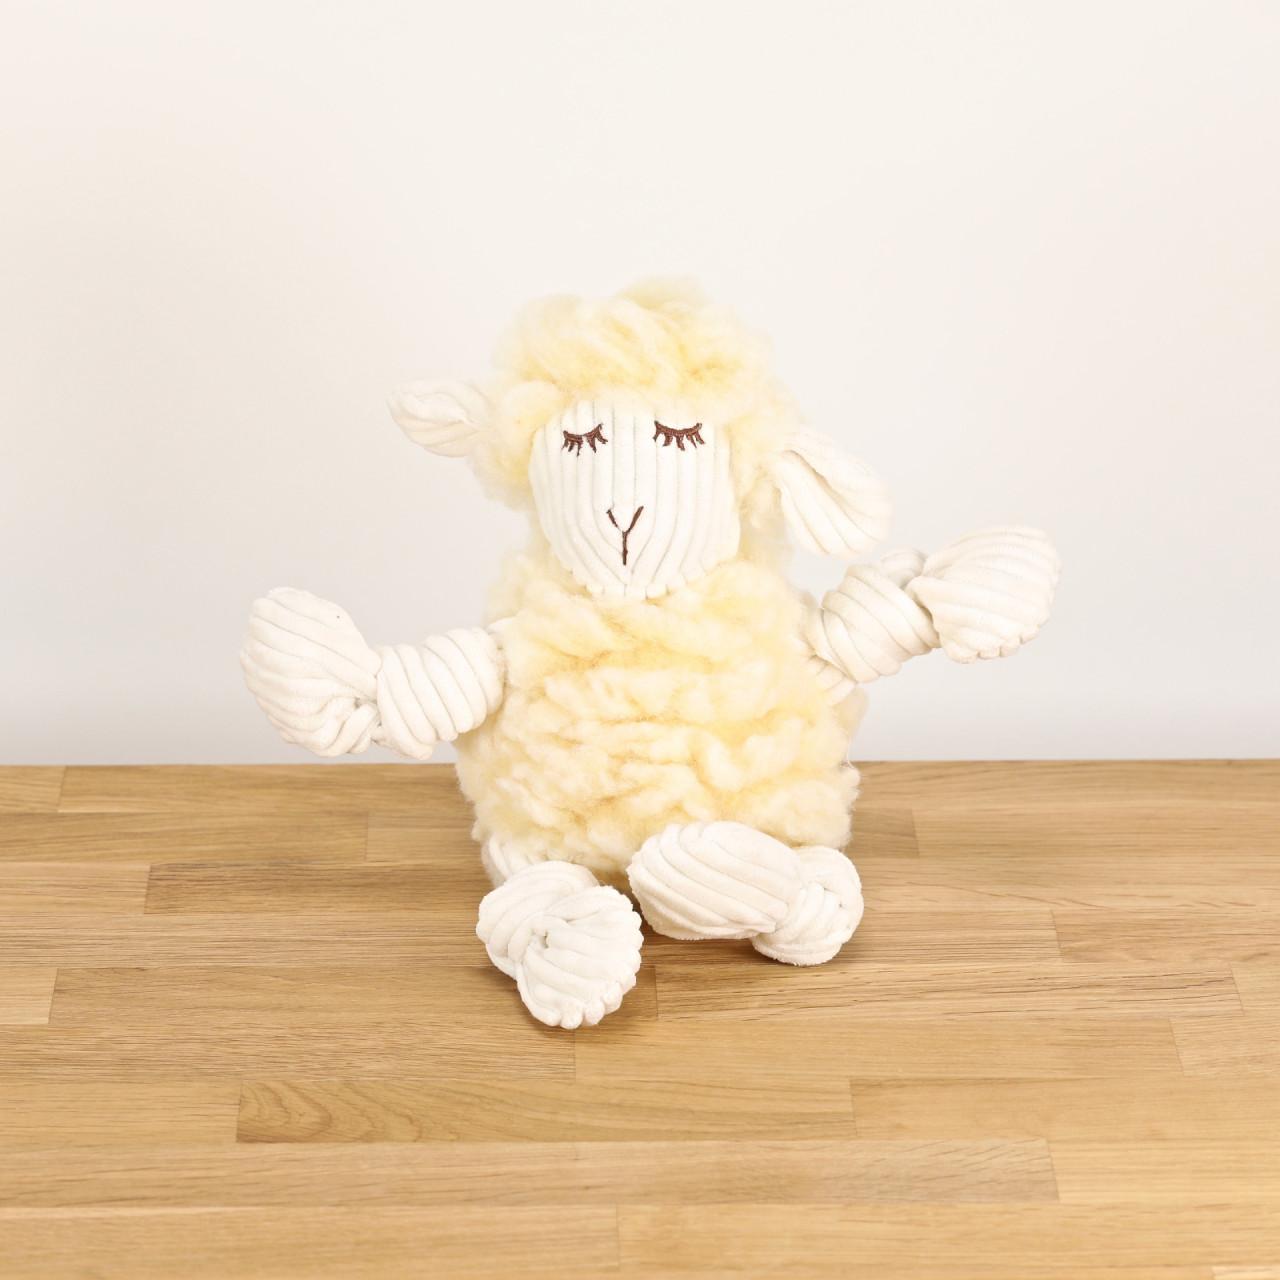 Hundespielzeug Louise, das Lamm